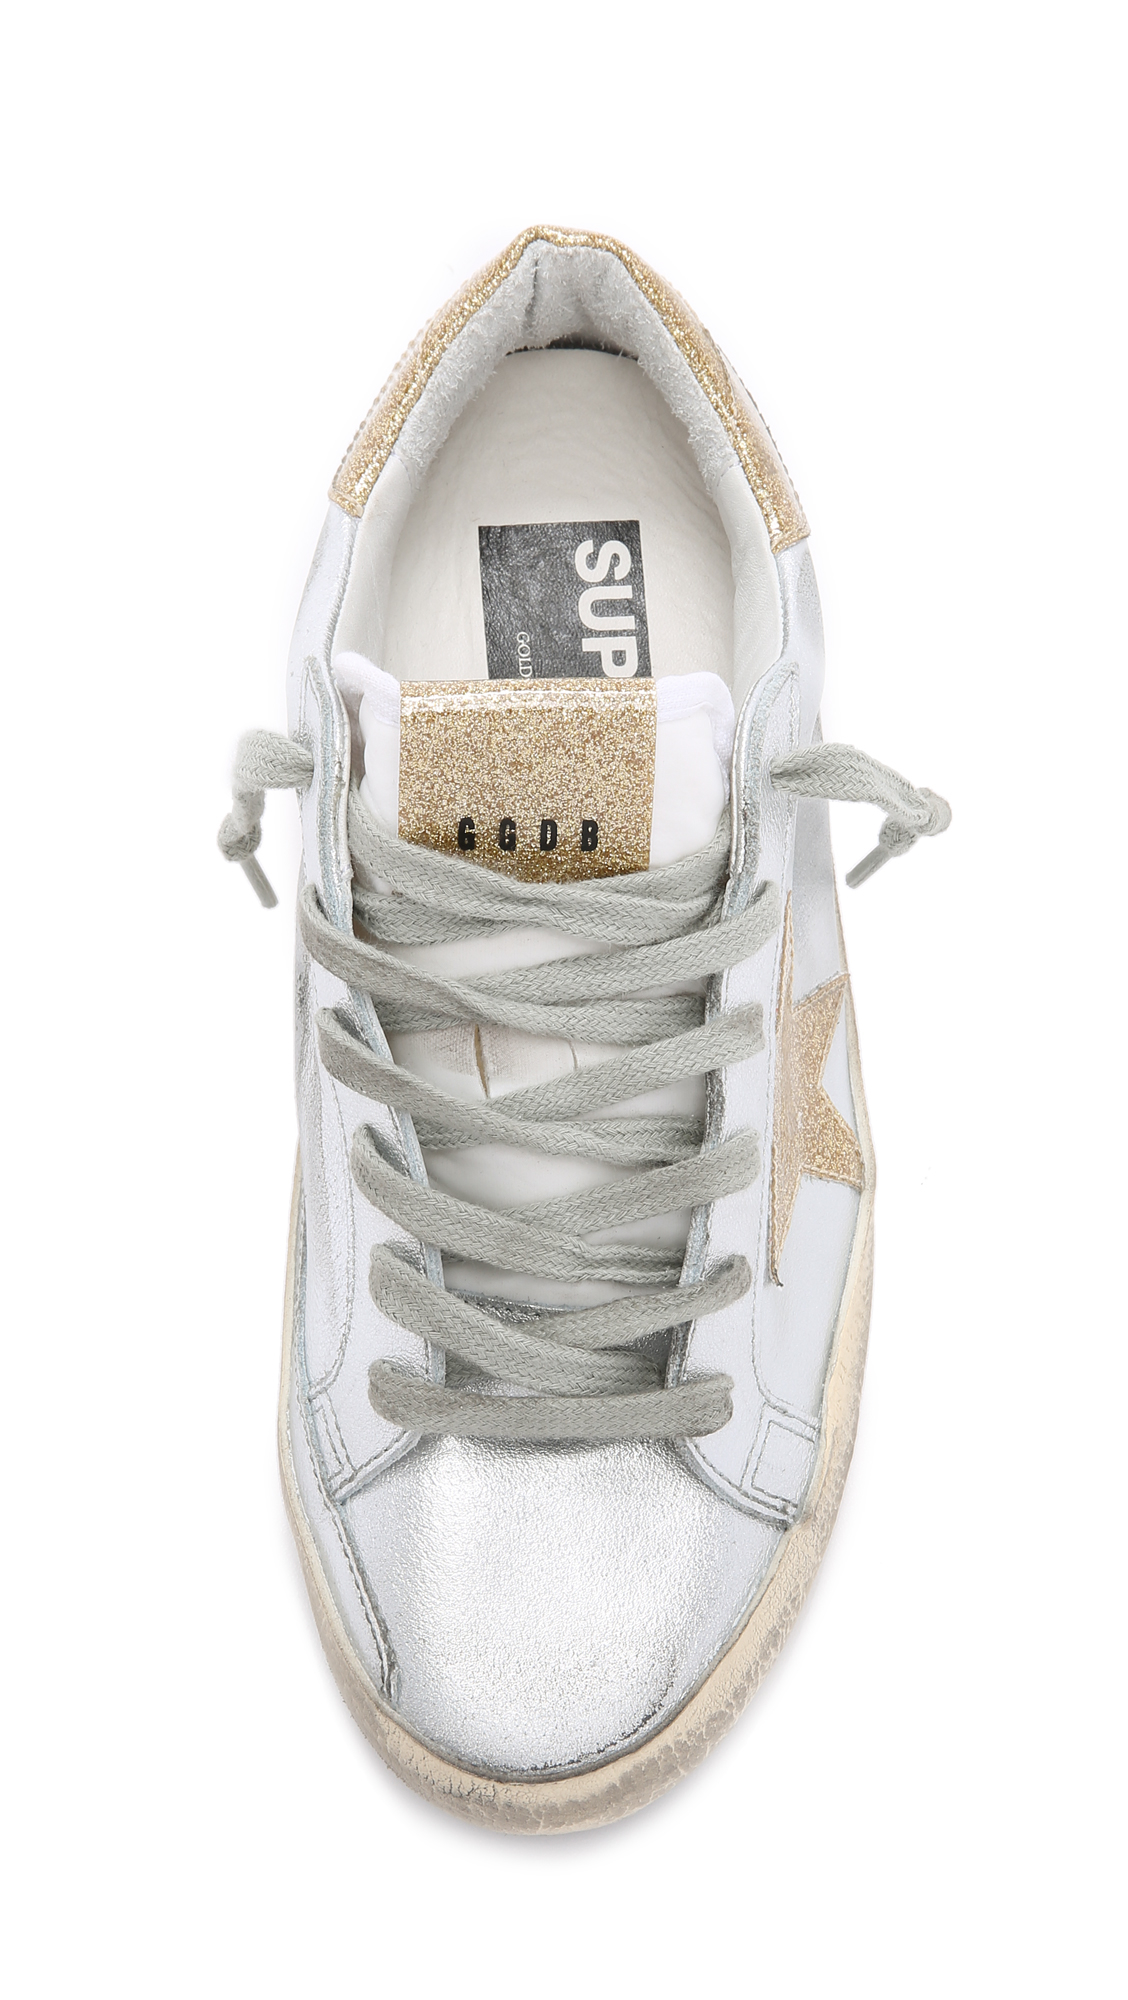 Golden Goose Deluxe Brand Superstar Leather Low-Top Sneakers in Silver/Gold (Metallic)